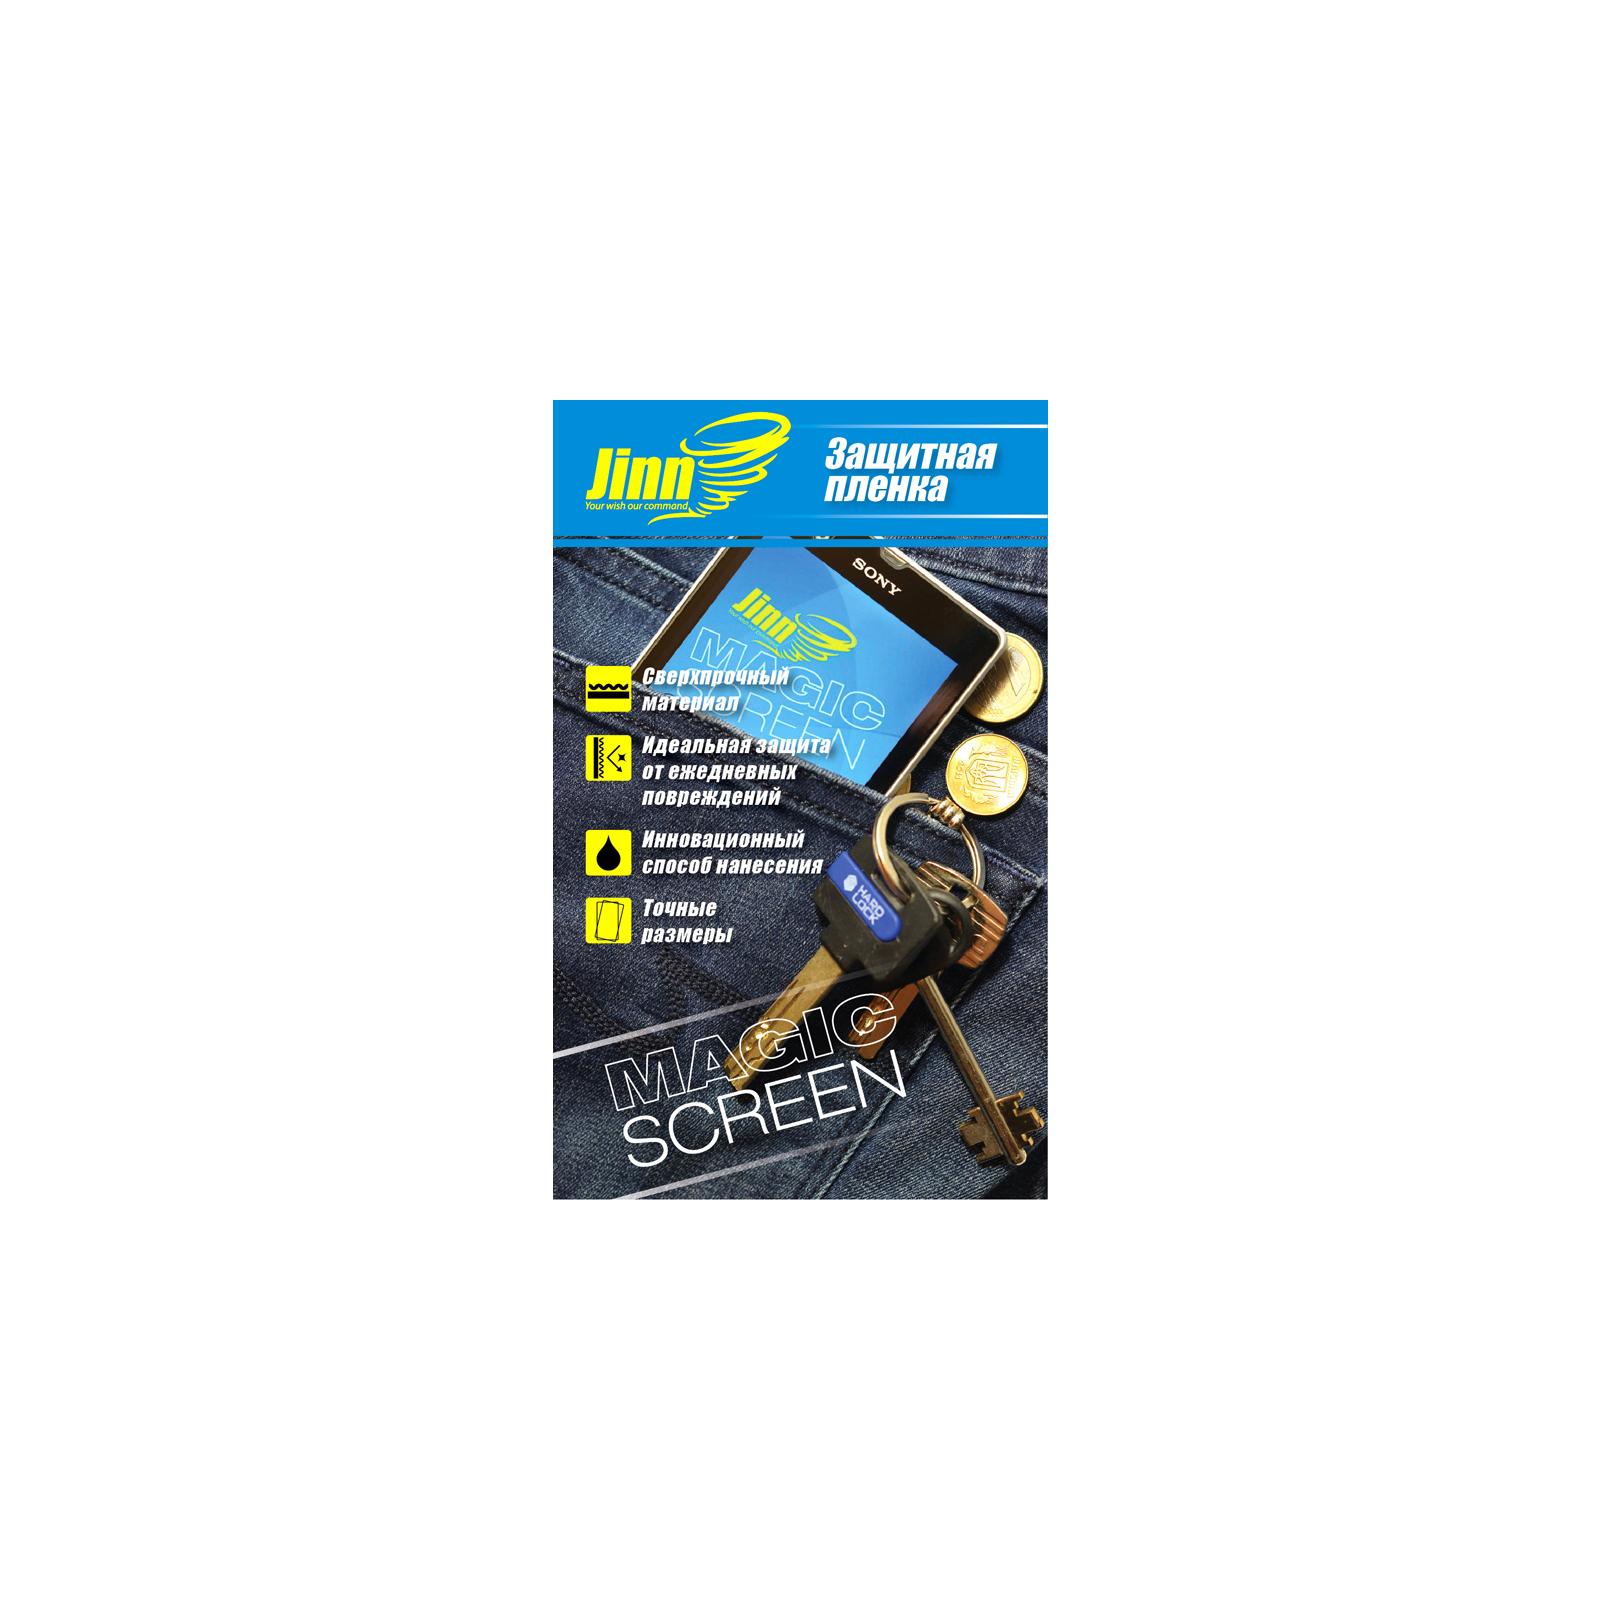 Пленка защитная JINN надміцна Magic Screen для HTC One X S720e (захист екрану) (HTC One X front)